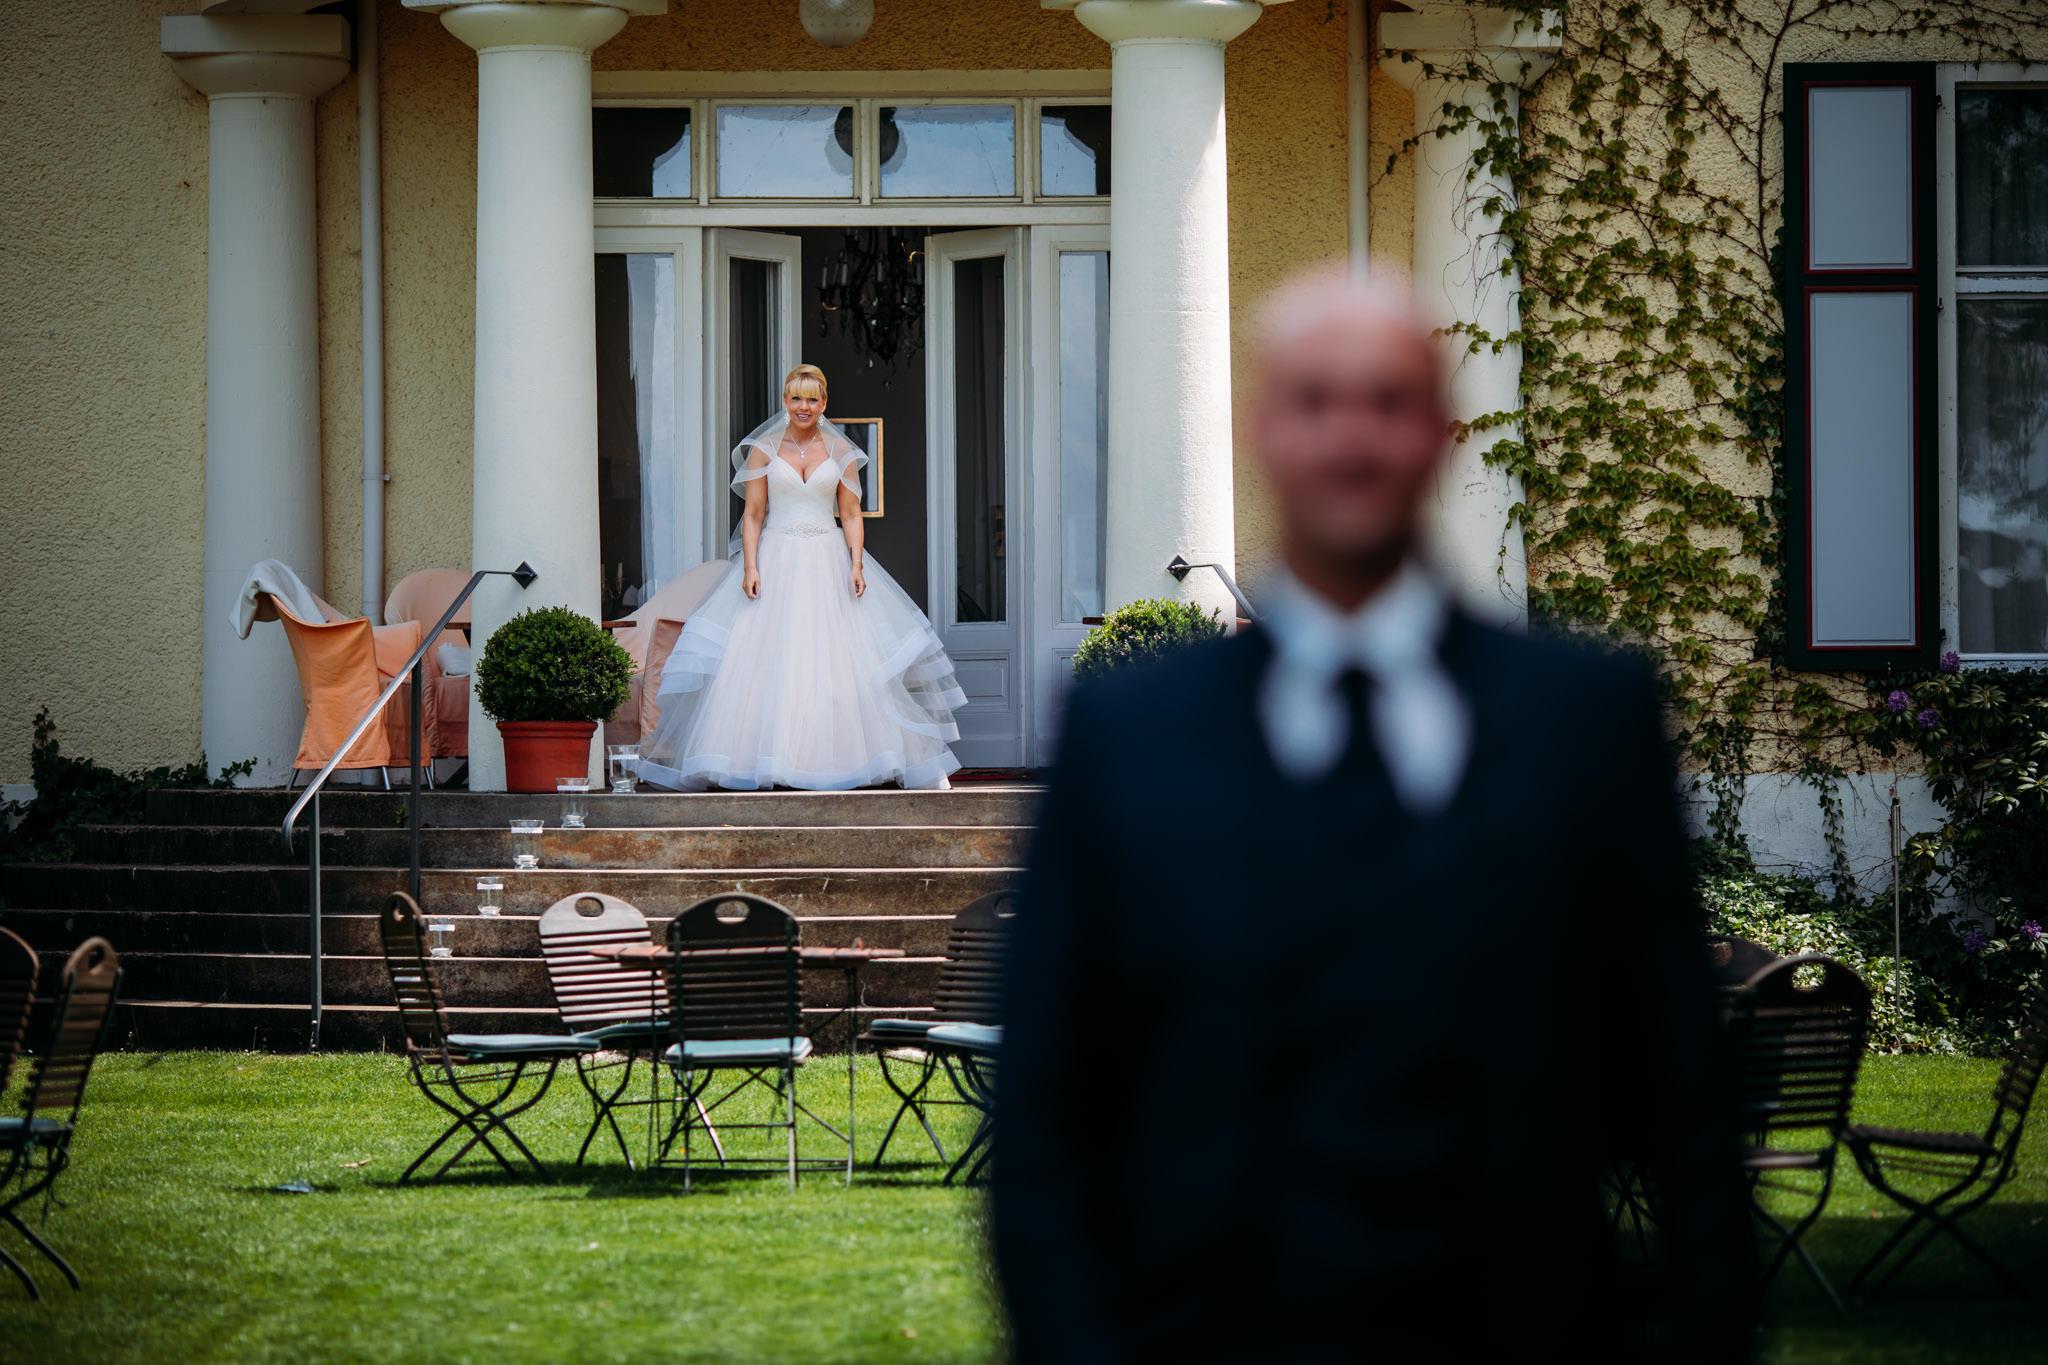 190531_Hochzeit_Potsdam_Schloss_Gut_Golm_Vorschau_web_0005.jpg